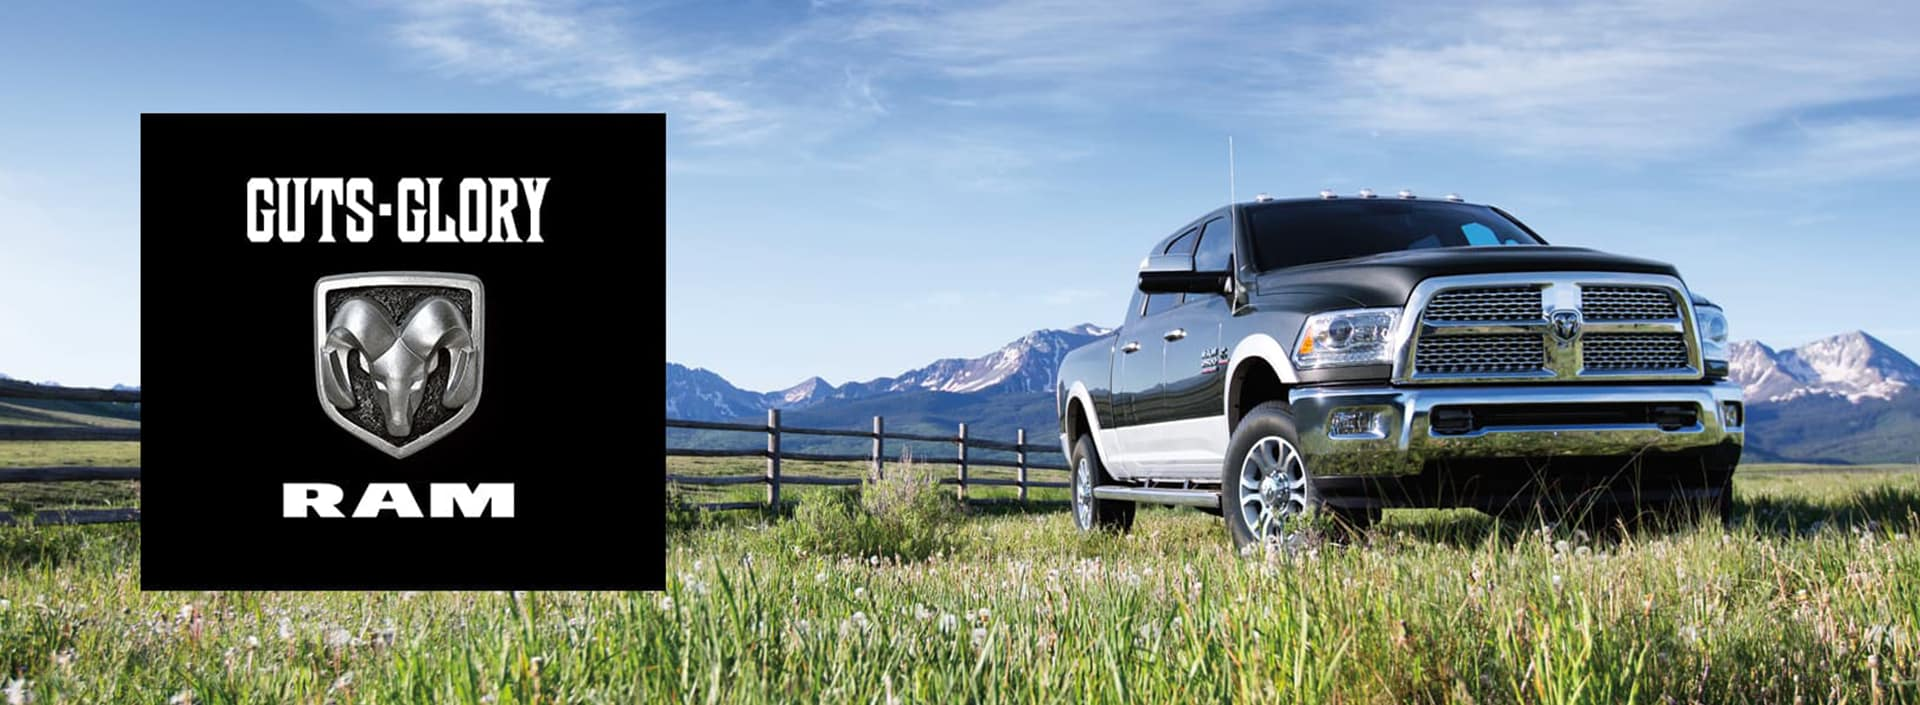 San Antonio Chrysler Dodge Jeep Ram | CDJR Dealer Serving New